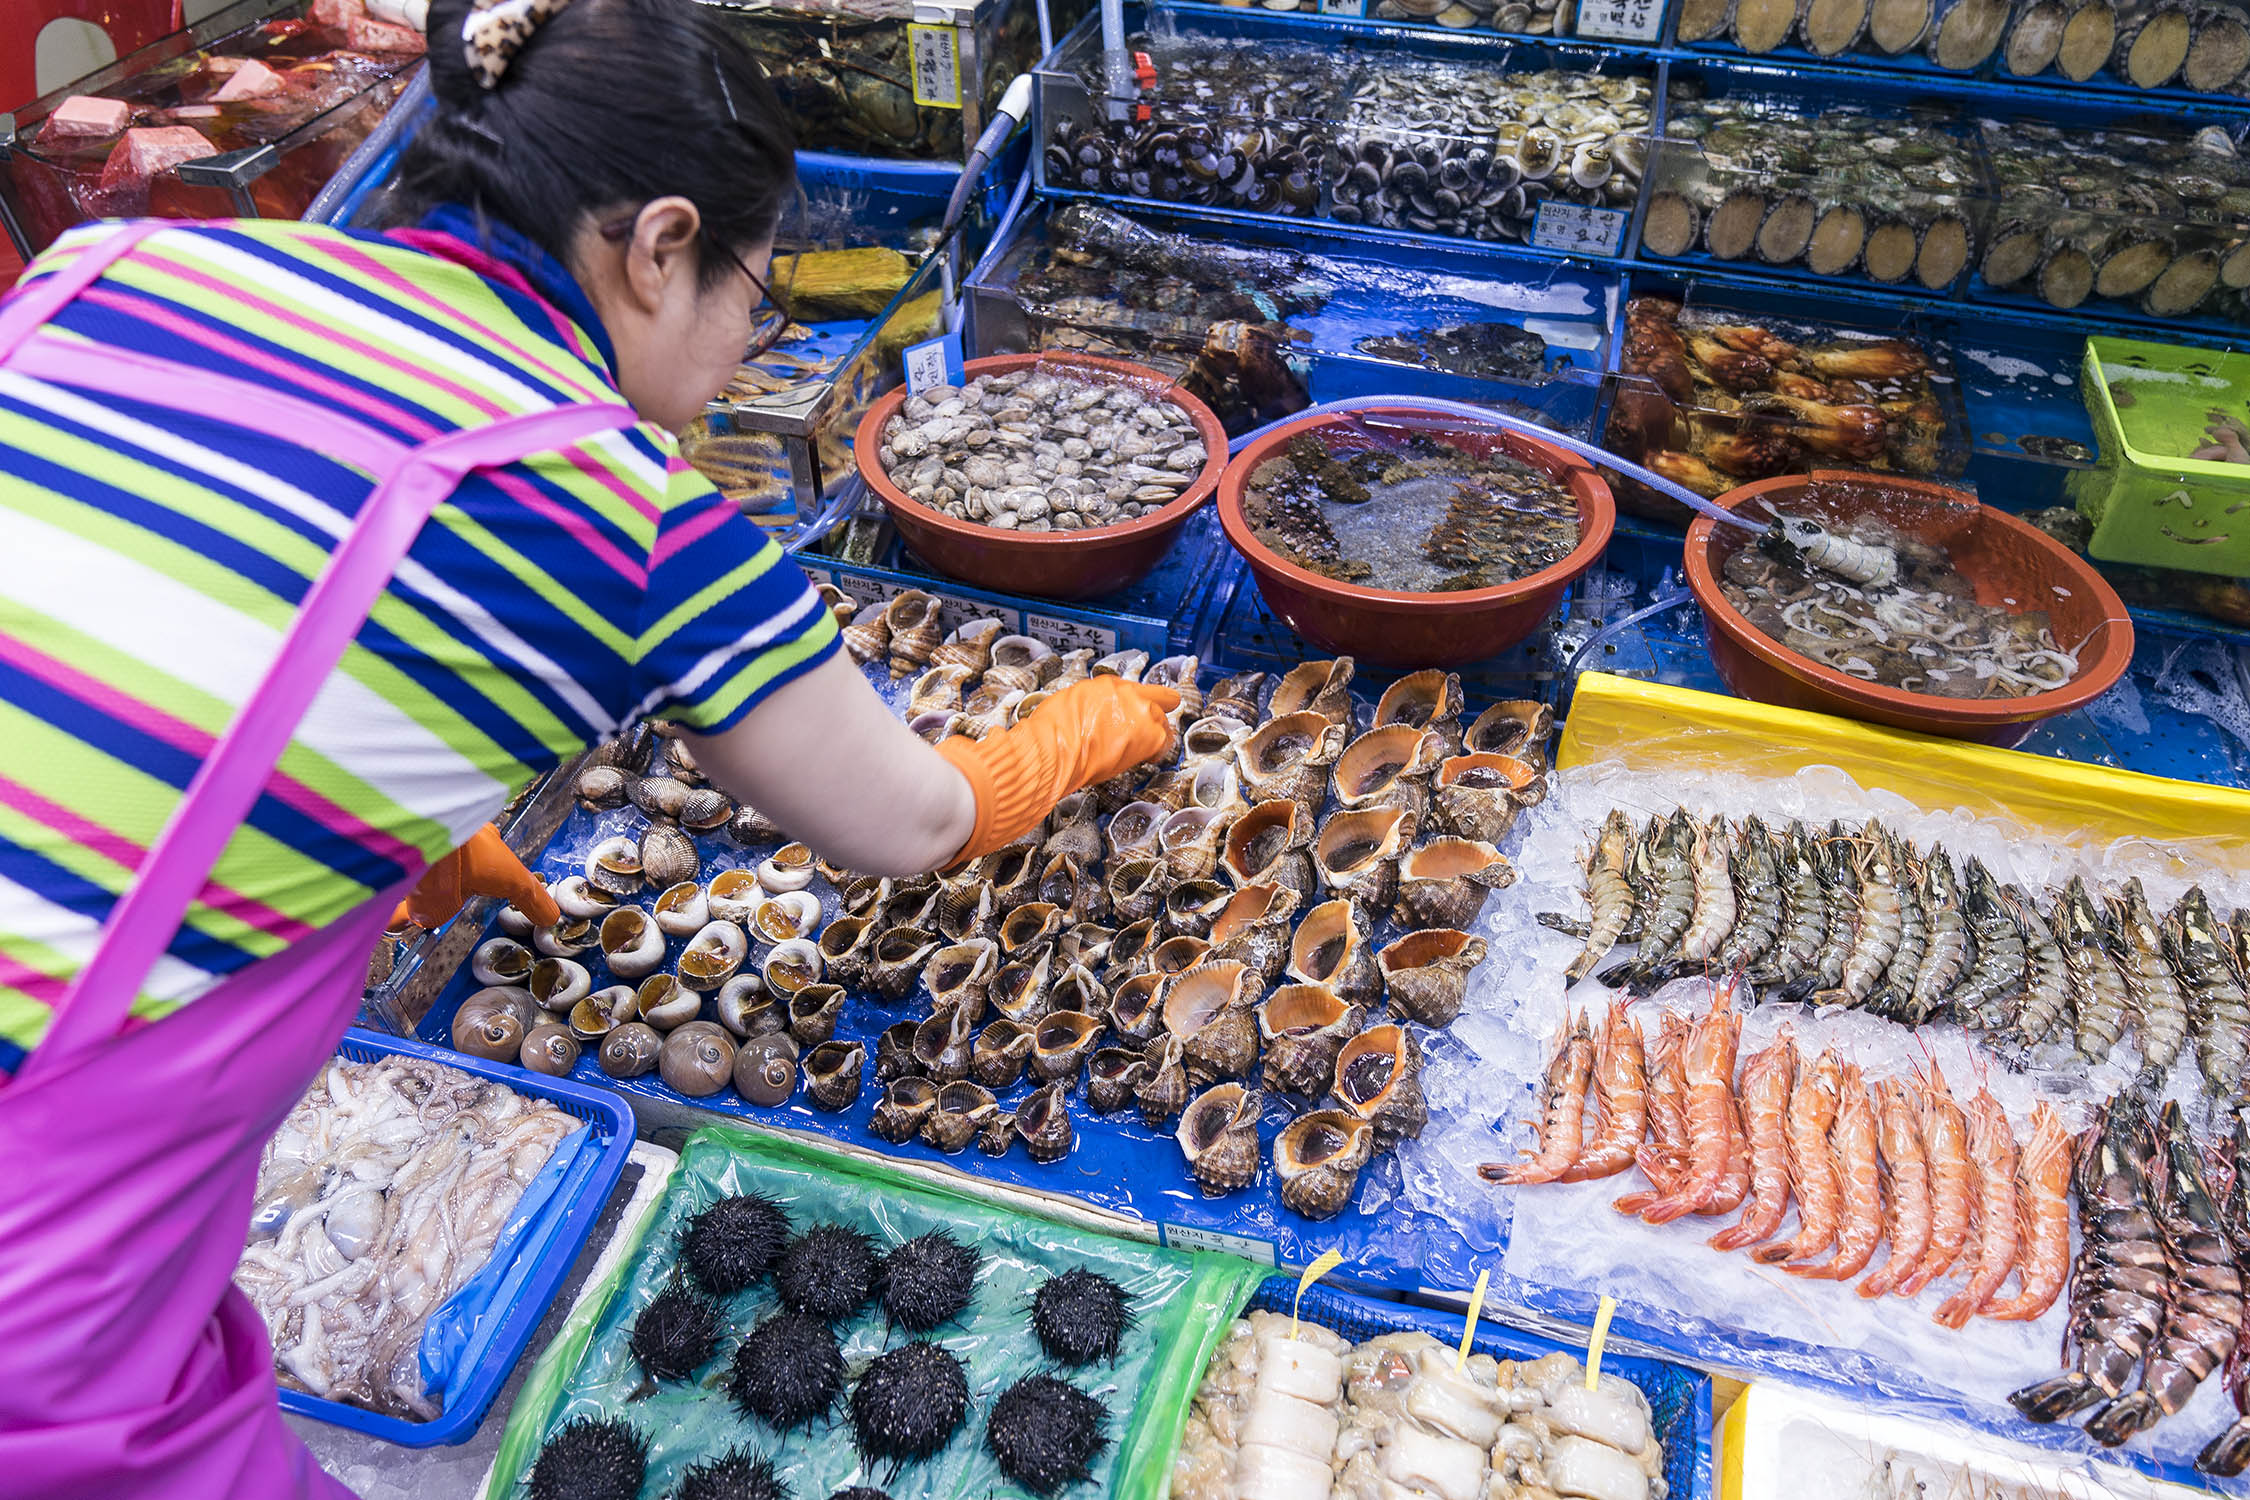 Sea urchins, abalone and more fresh shellfish